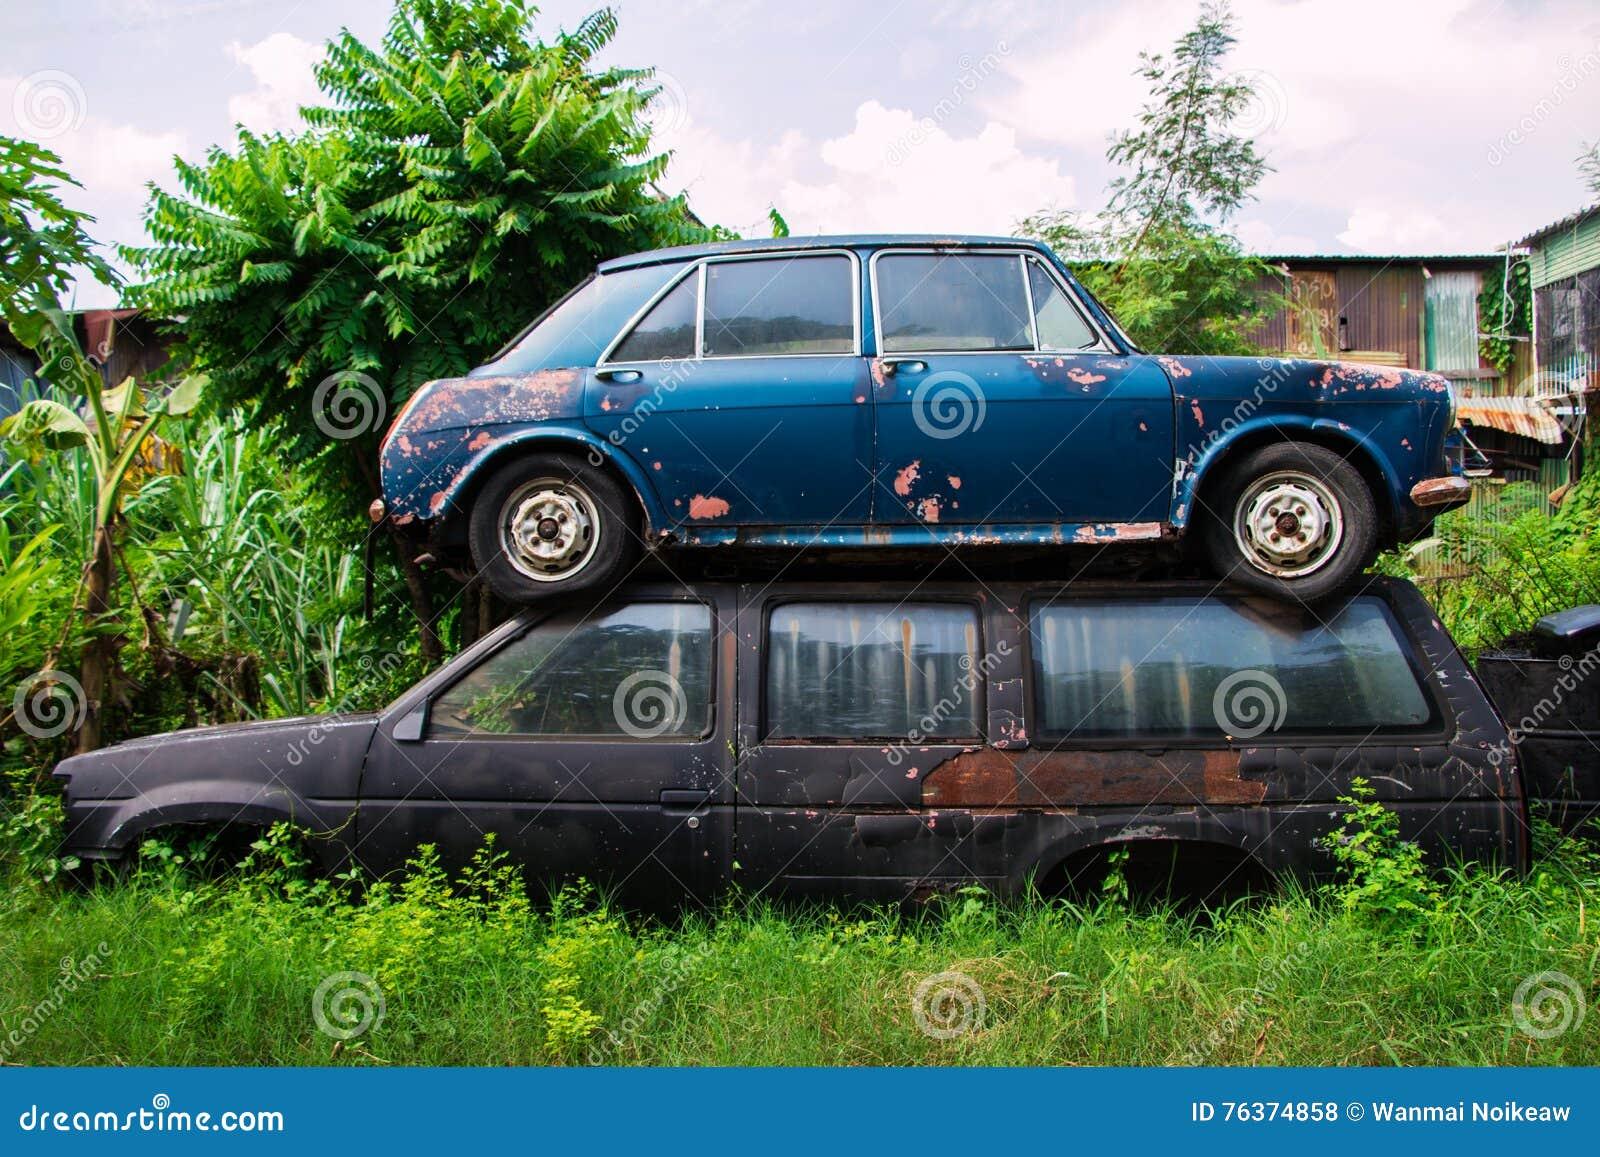 image de voiture ancienne voitures anciennes page 2 rallye en provence voiture ancienne. Black Bedroom Furniture Sets. Home Design Ideas